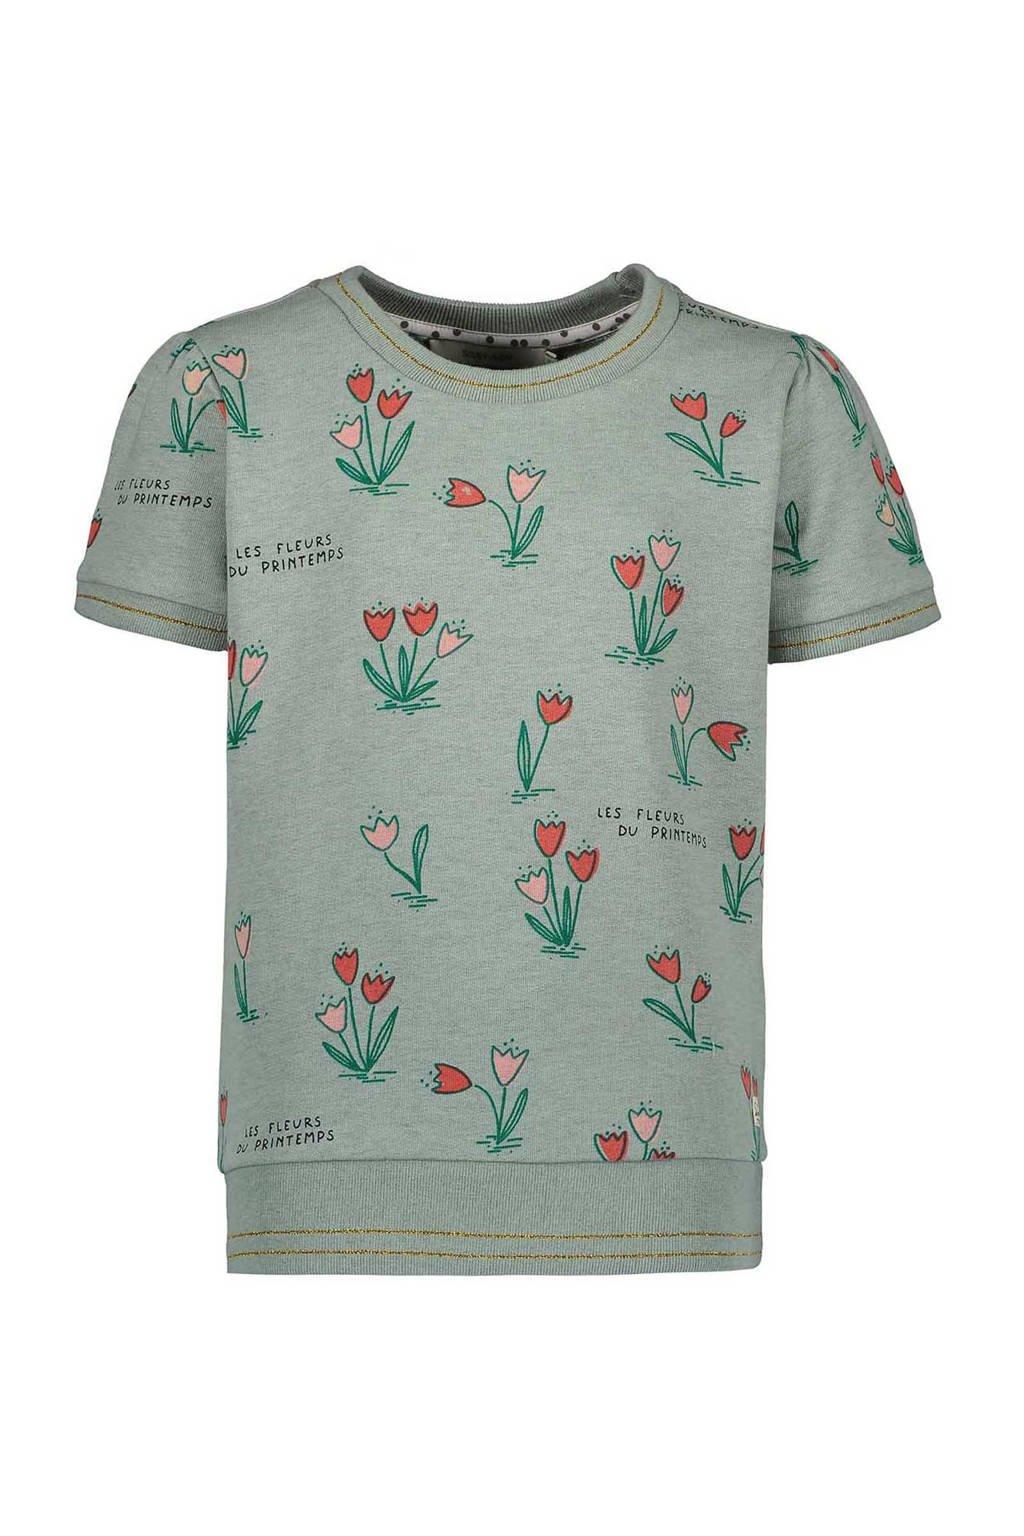 Sissy-Boy gebloemd T-shirt grijs, Grijsgroen